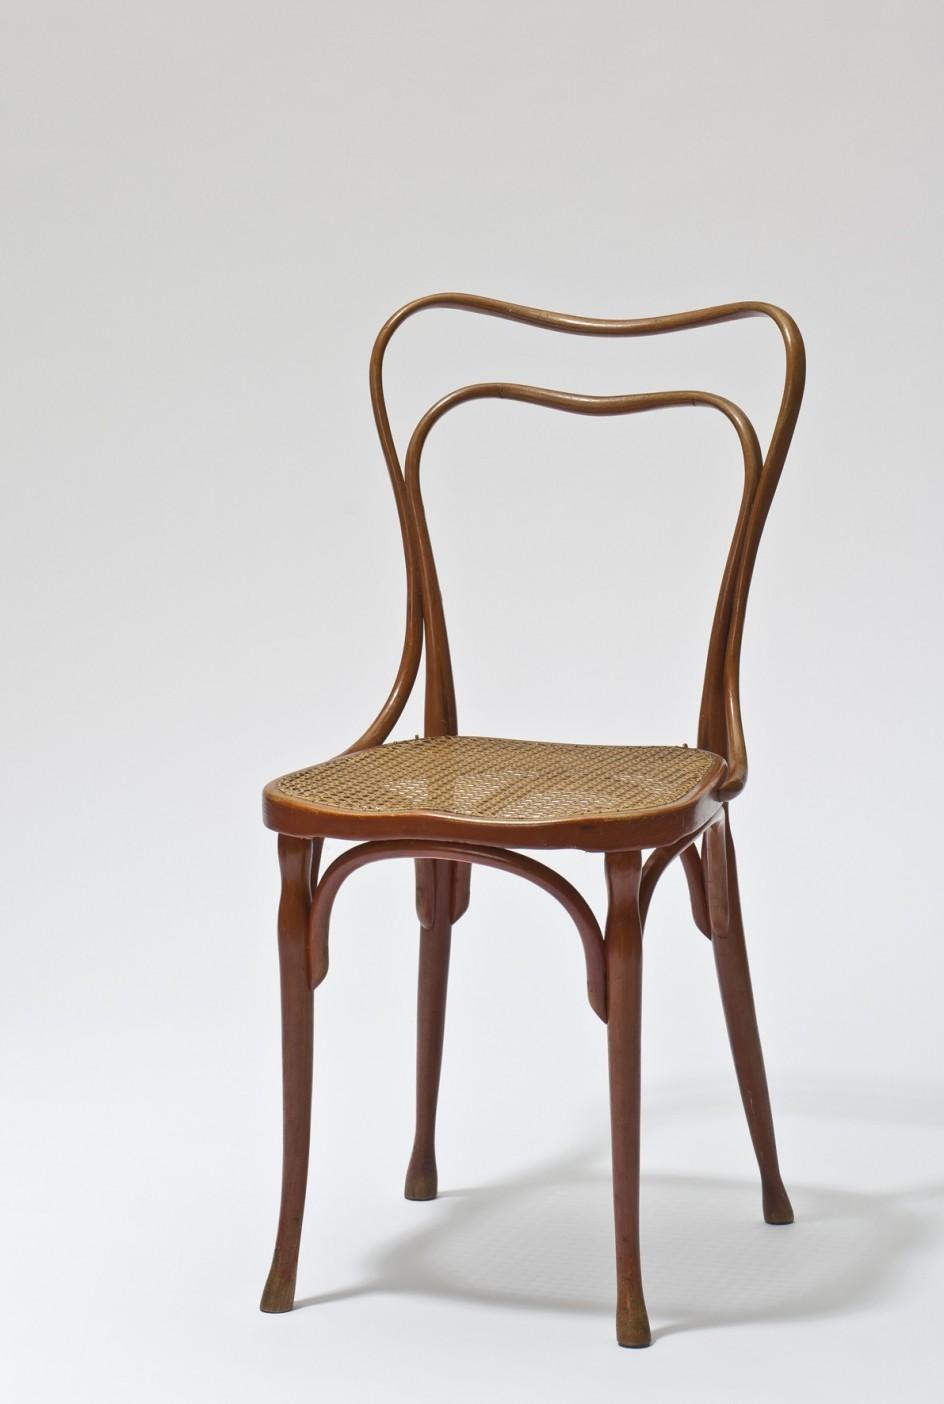 Foto Adolf Loos Chair For Caf Museum Vienna 1899 Hoffmann  # Adolf Loos Muebles